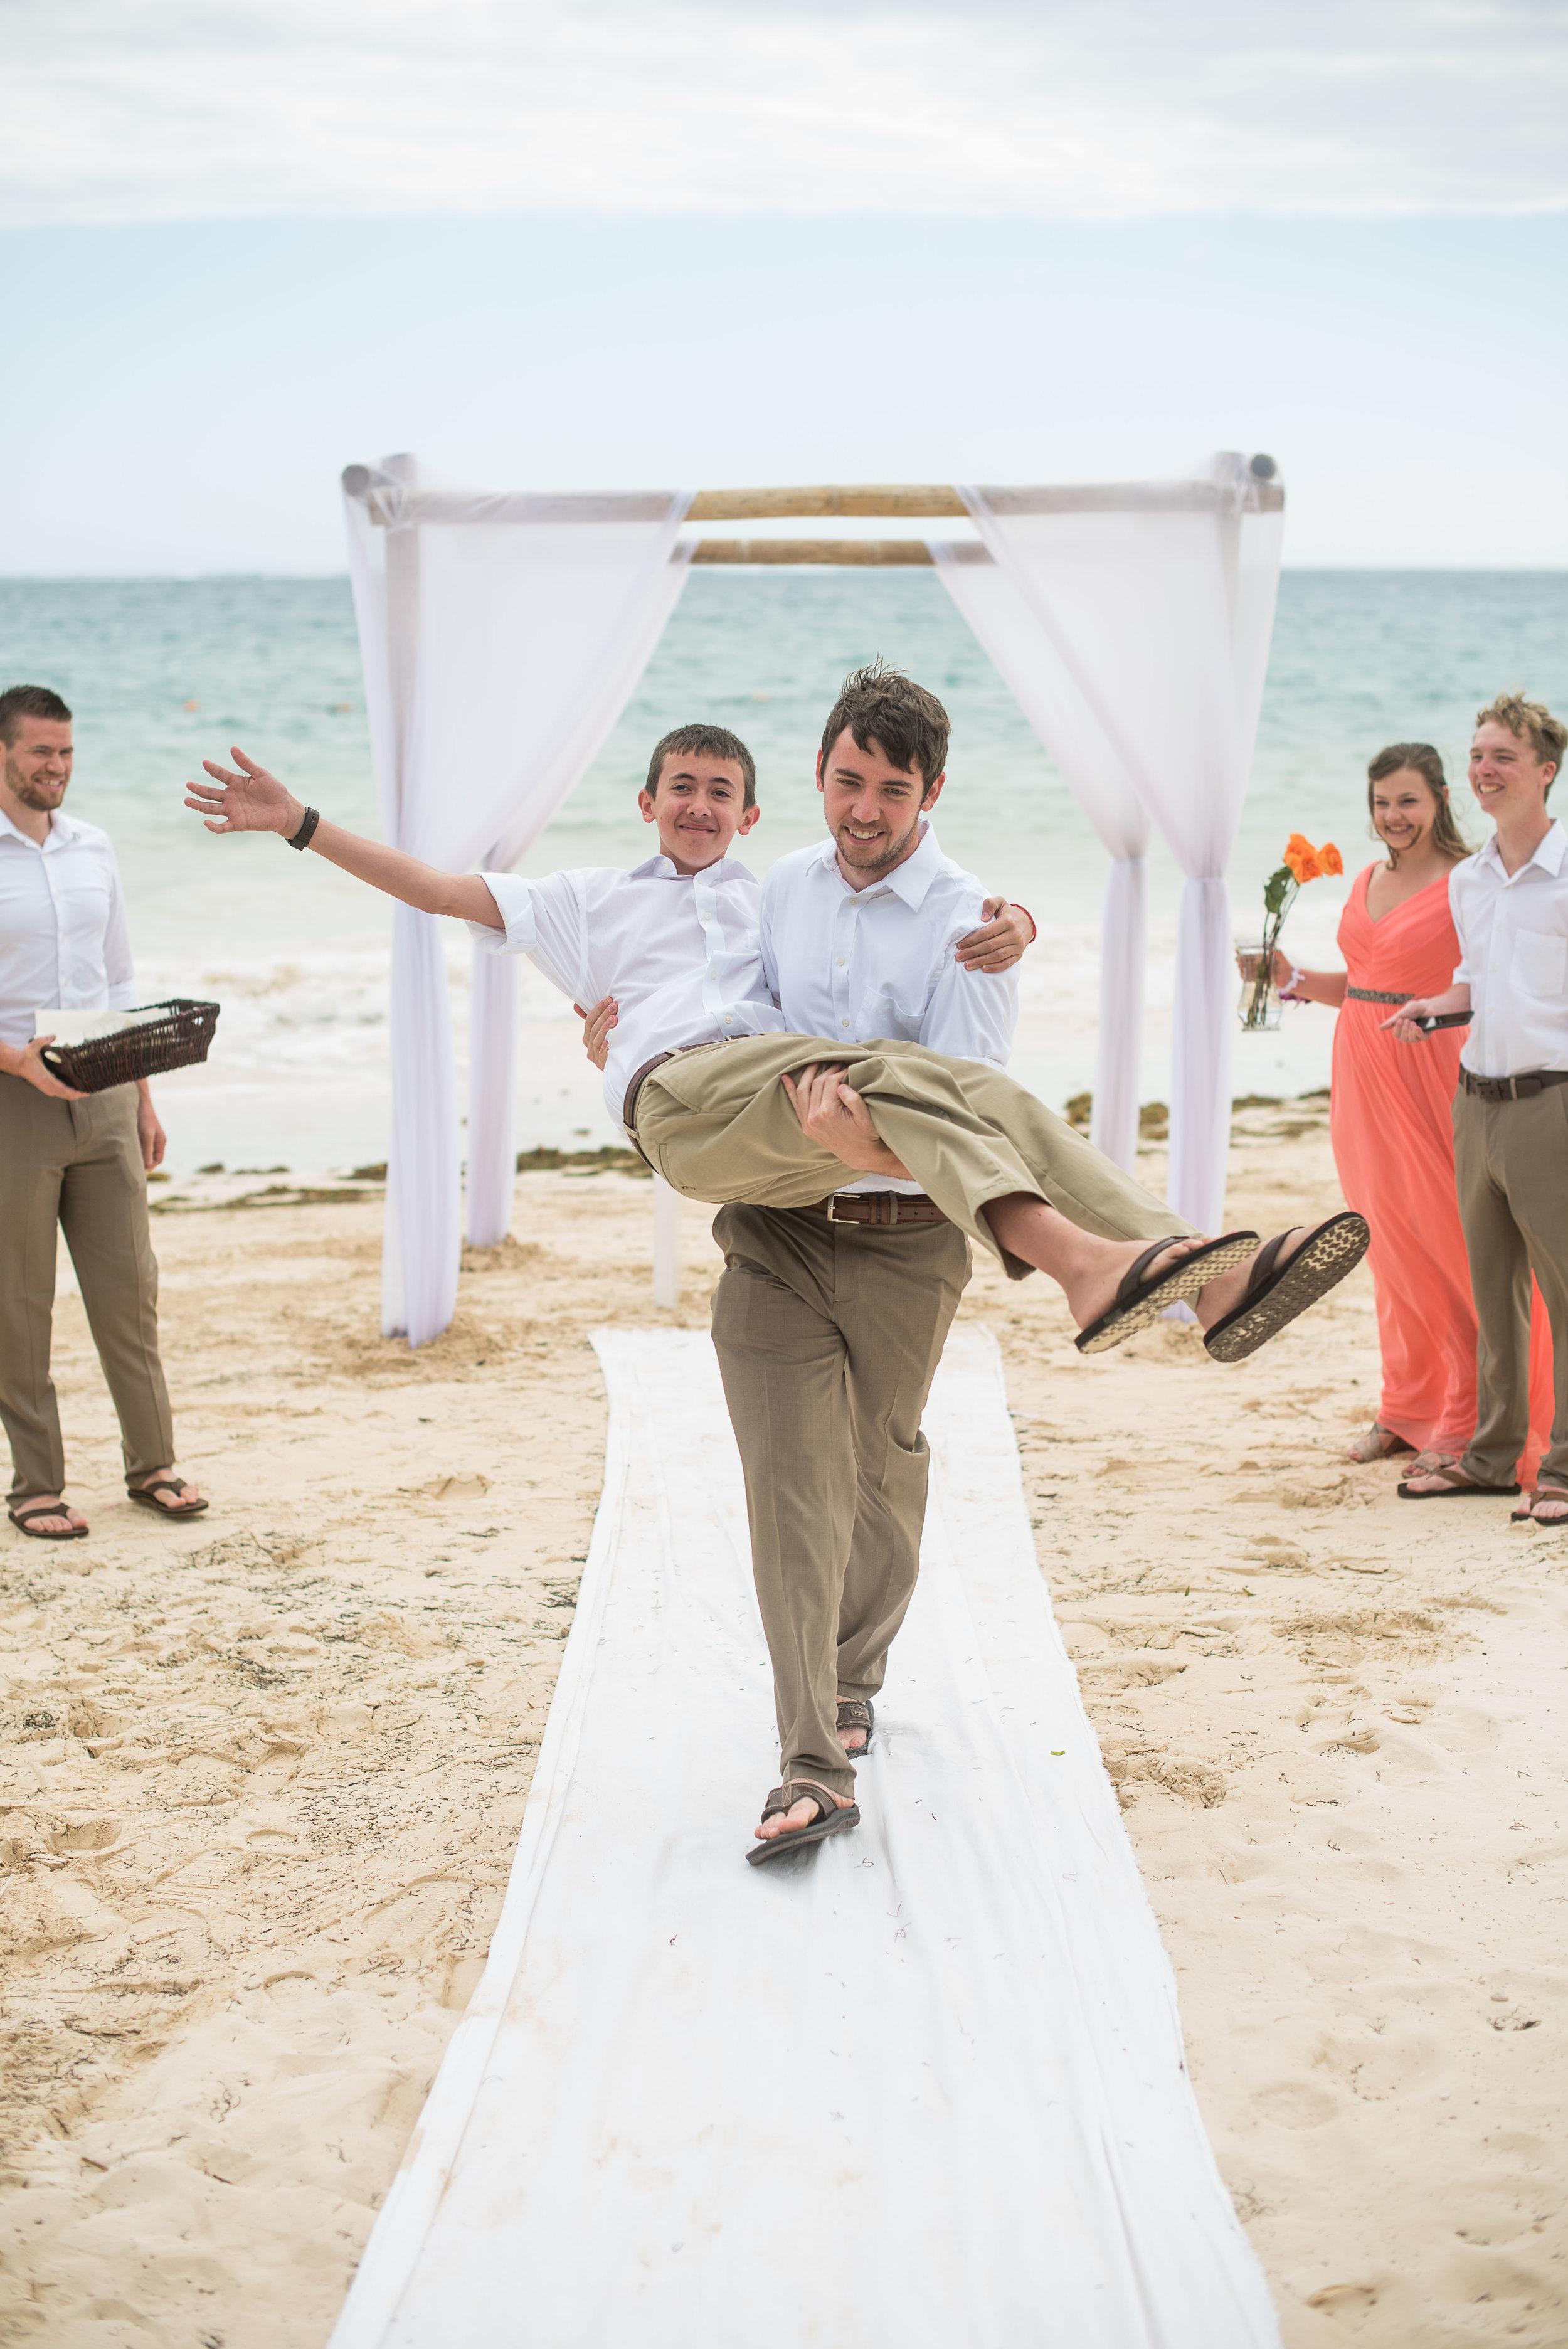 Cancun Vow Renewal Photography Destination Photography Mexico-34.JPG